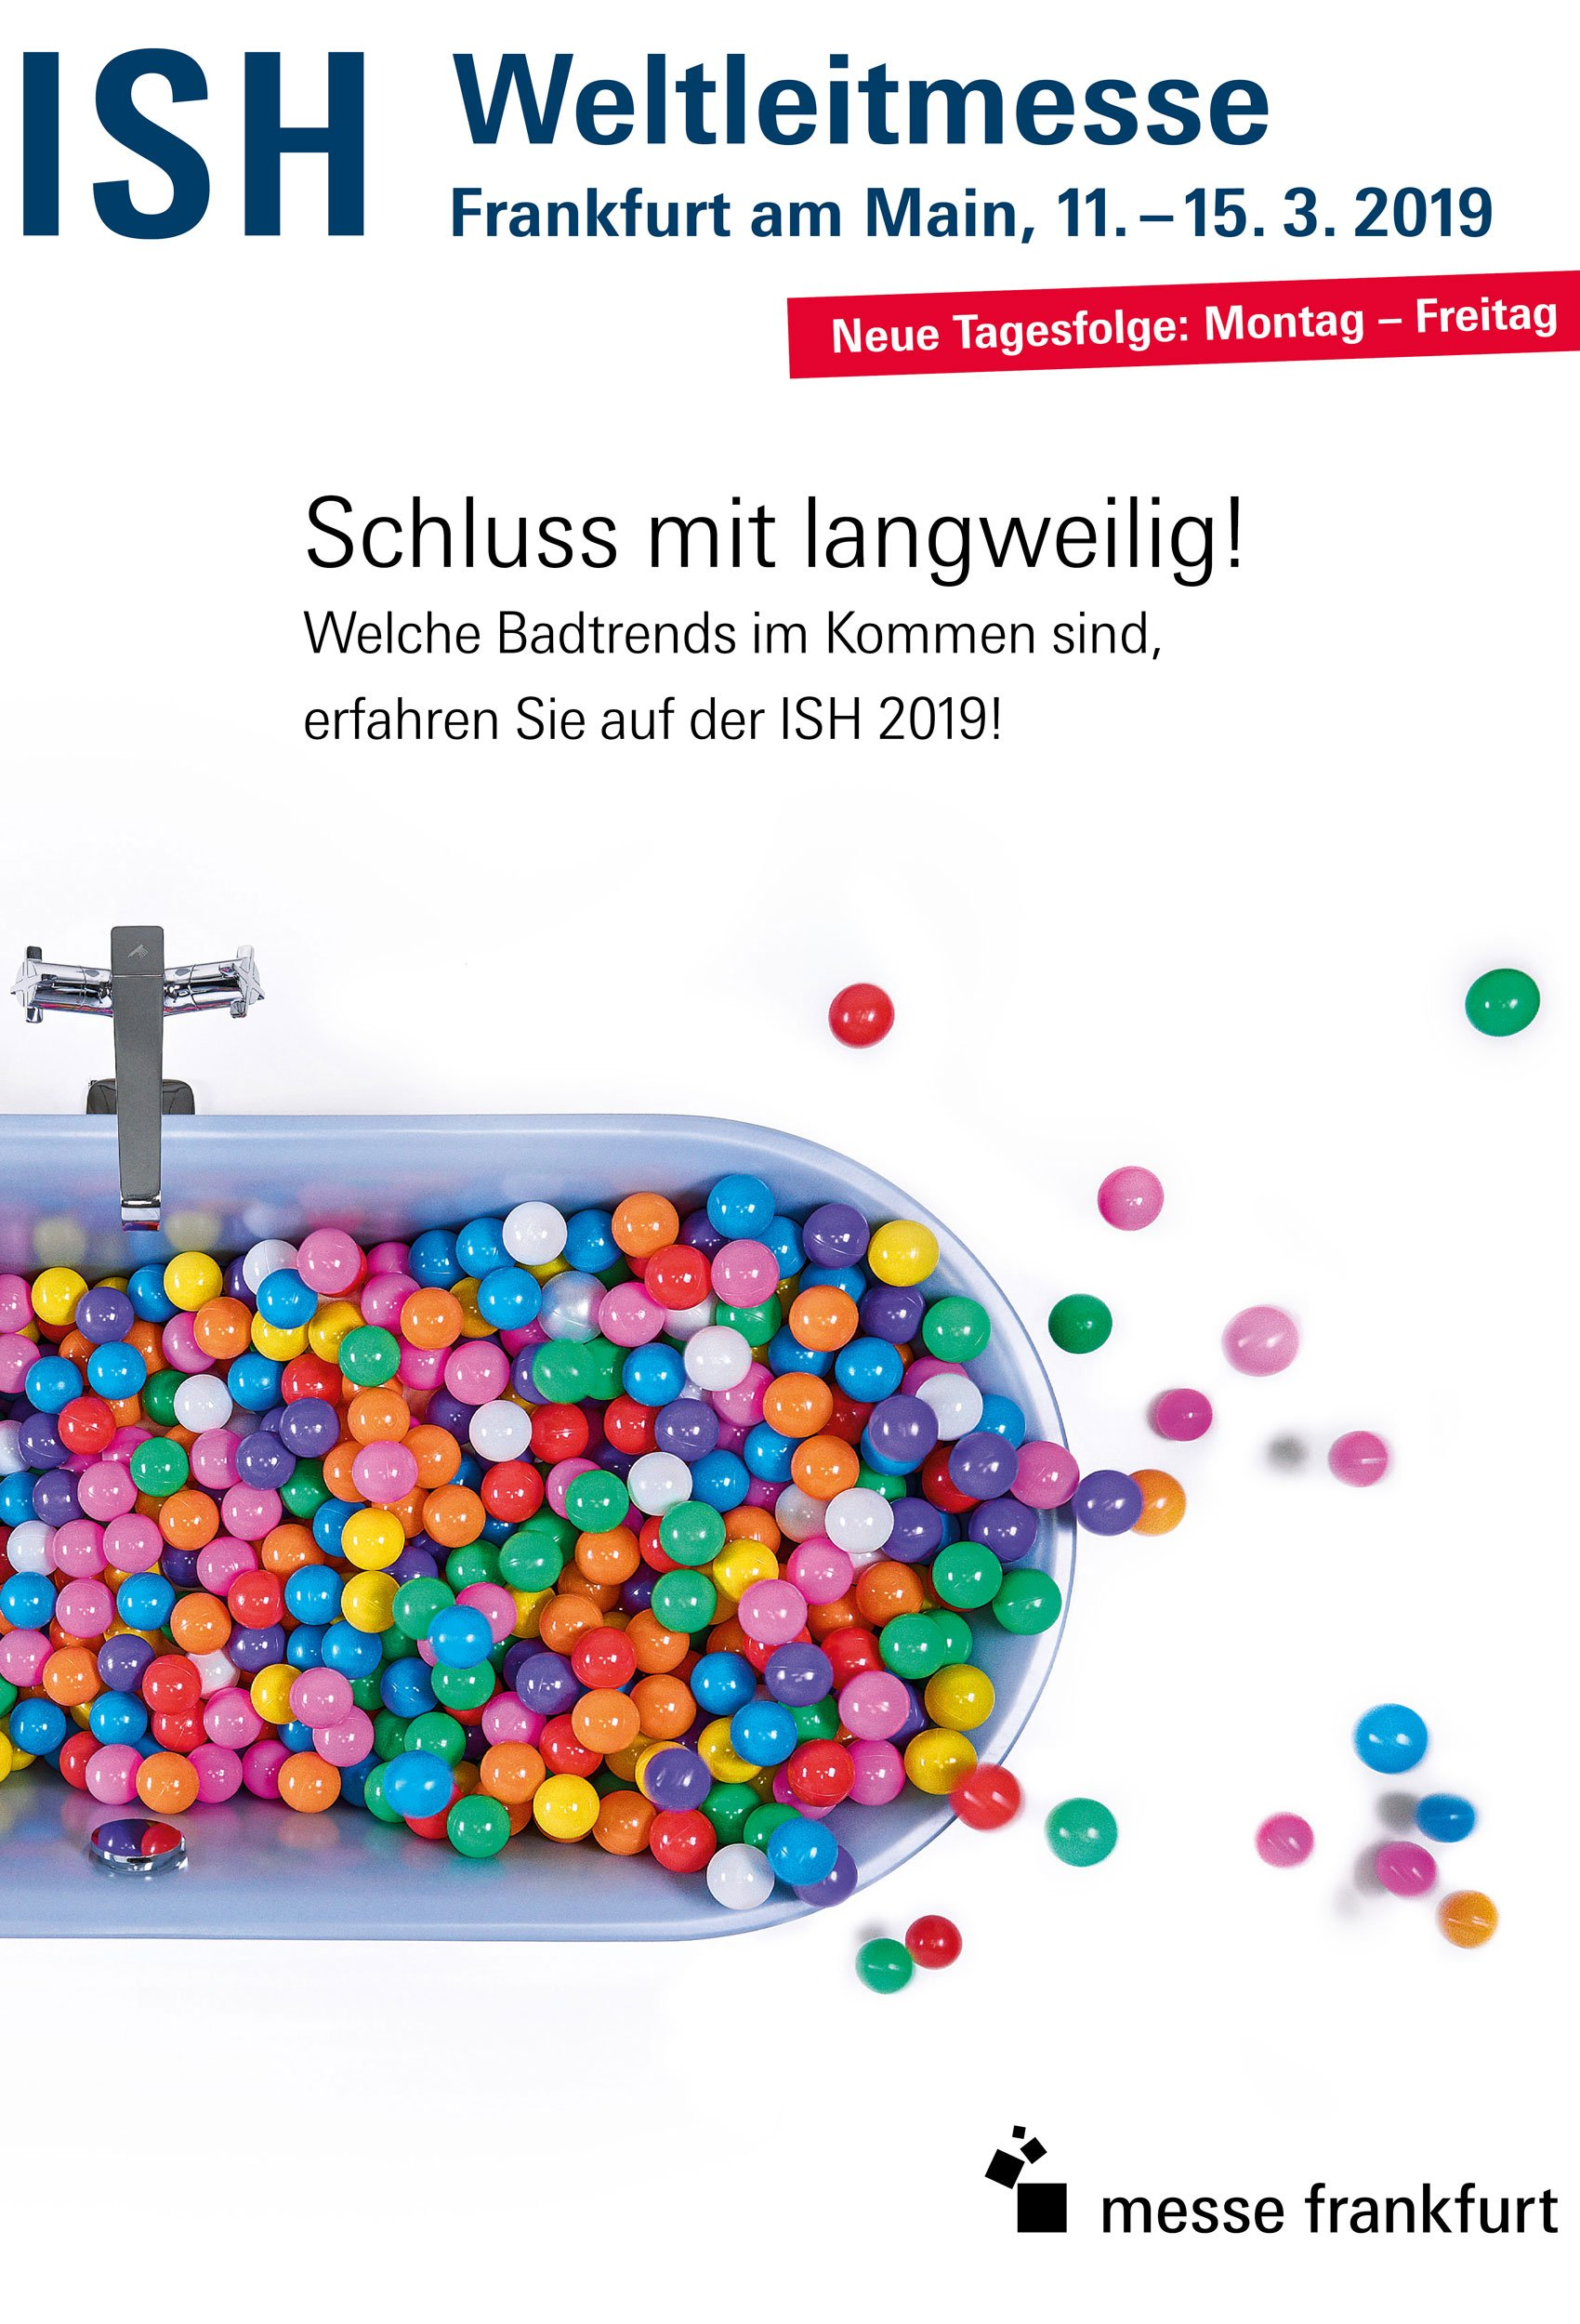 https://farconsulting.de/wp-content/uploads/2020/03/04_Pop-up-my-Bathroom-Key-Visual.jpg